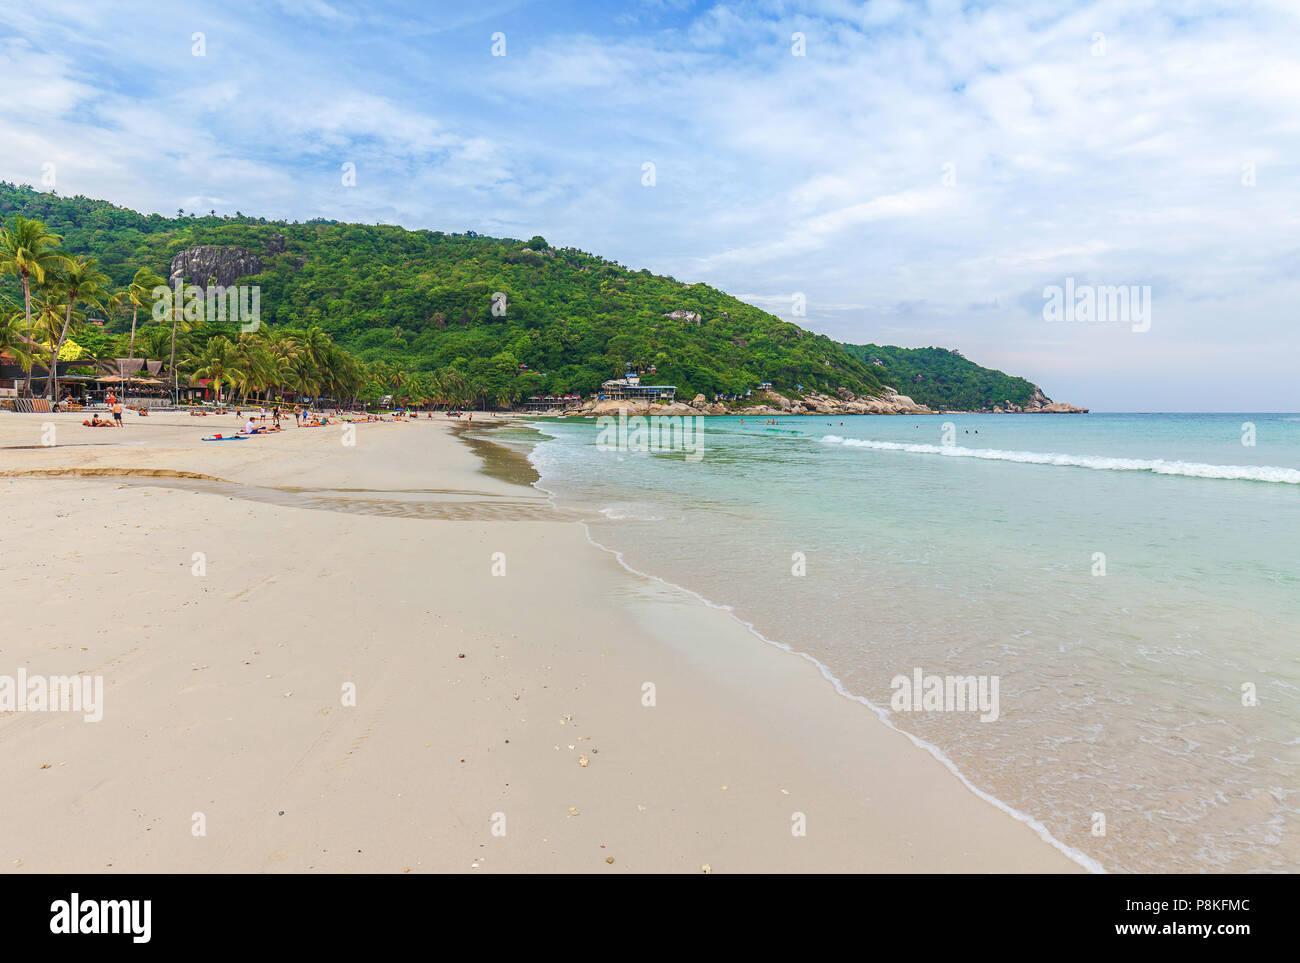 Haad Rin beach. Venue of the famous Full Moon Party. Koh Phangan. Thailand. - Stock Image